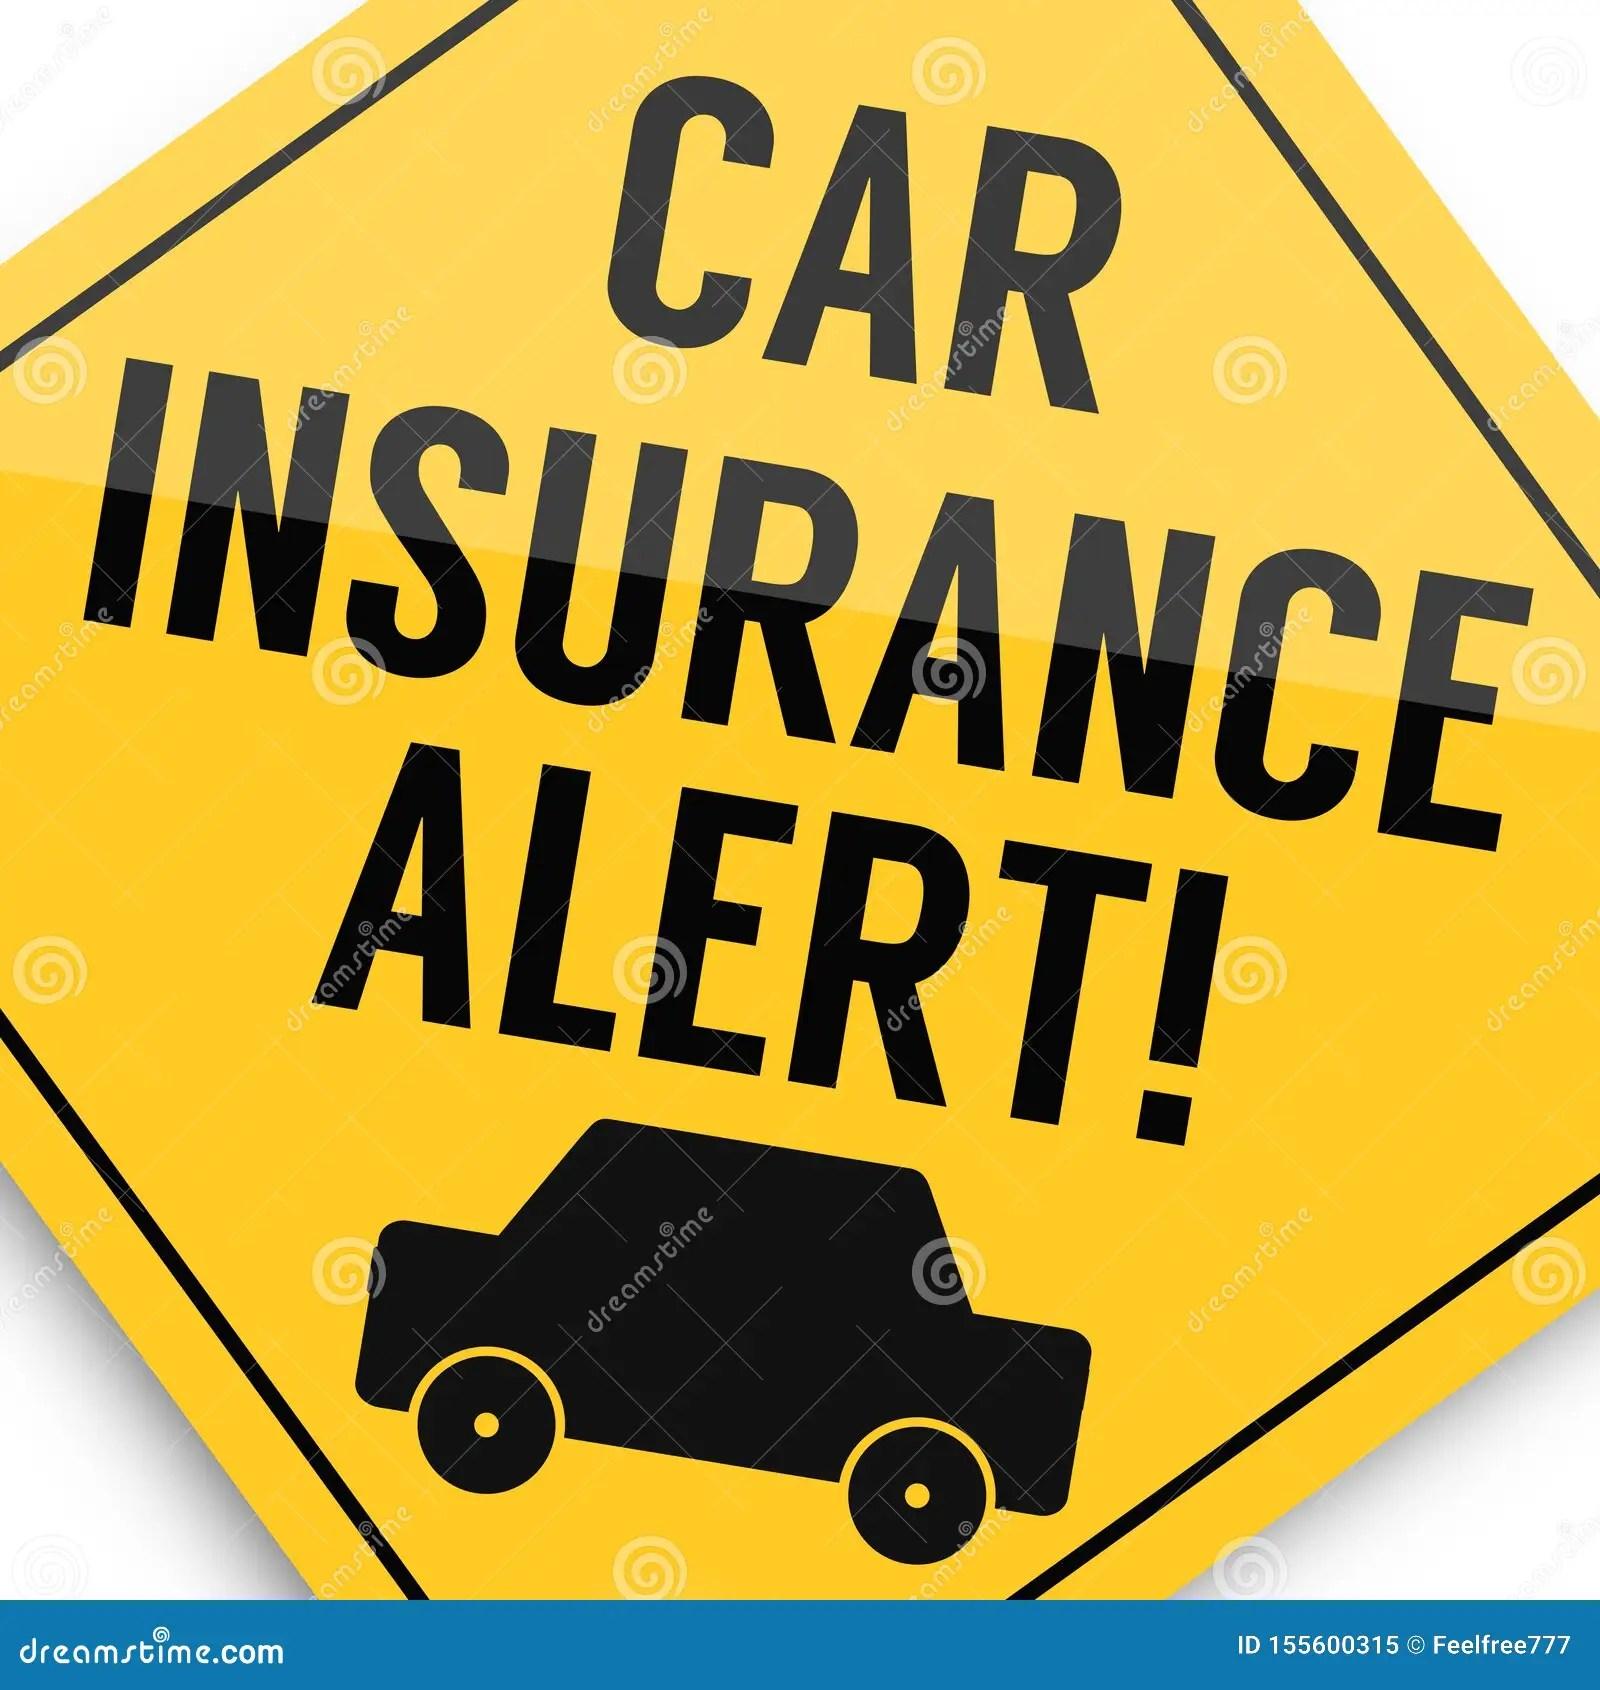 Car Insurance Alert Super Quality Business Picture Stock Illustration Illustration Of Boss High 155600315